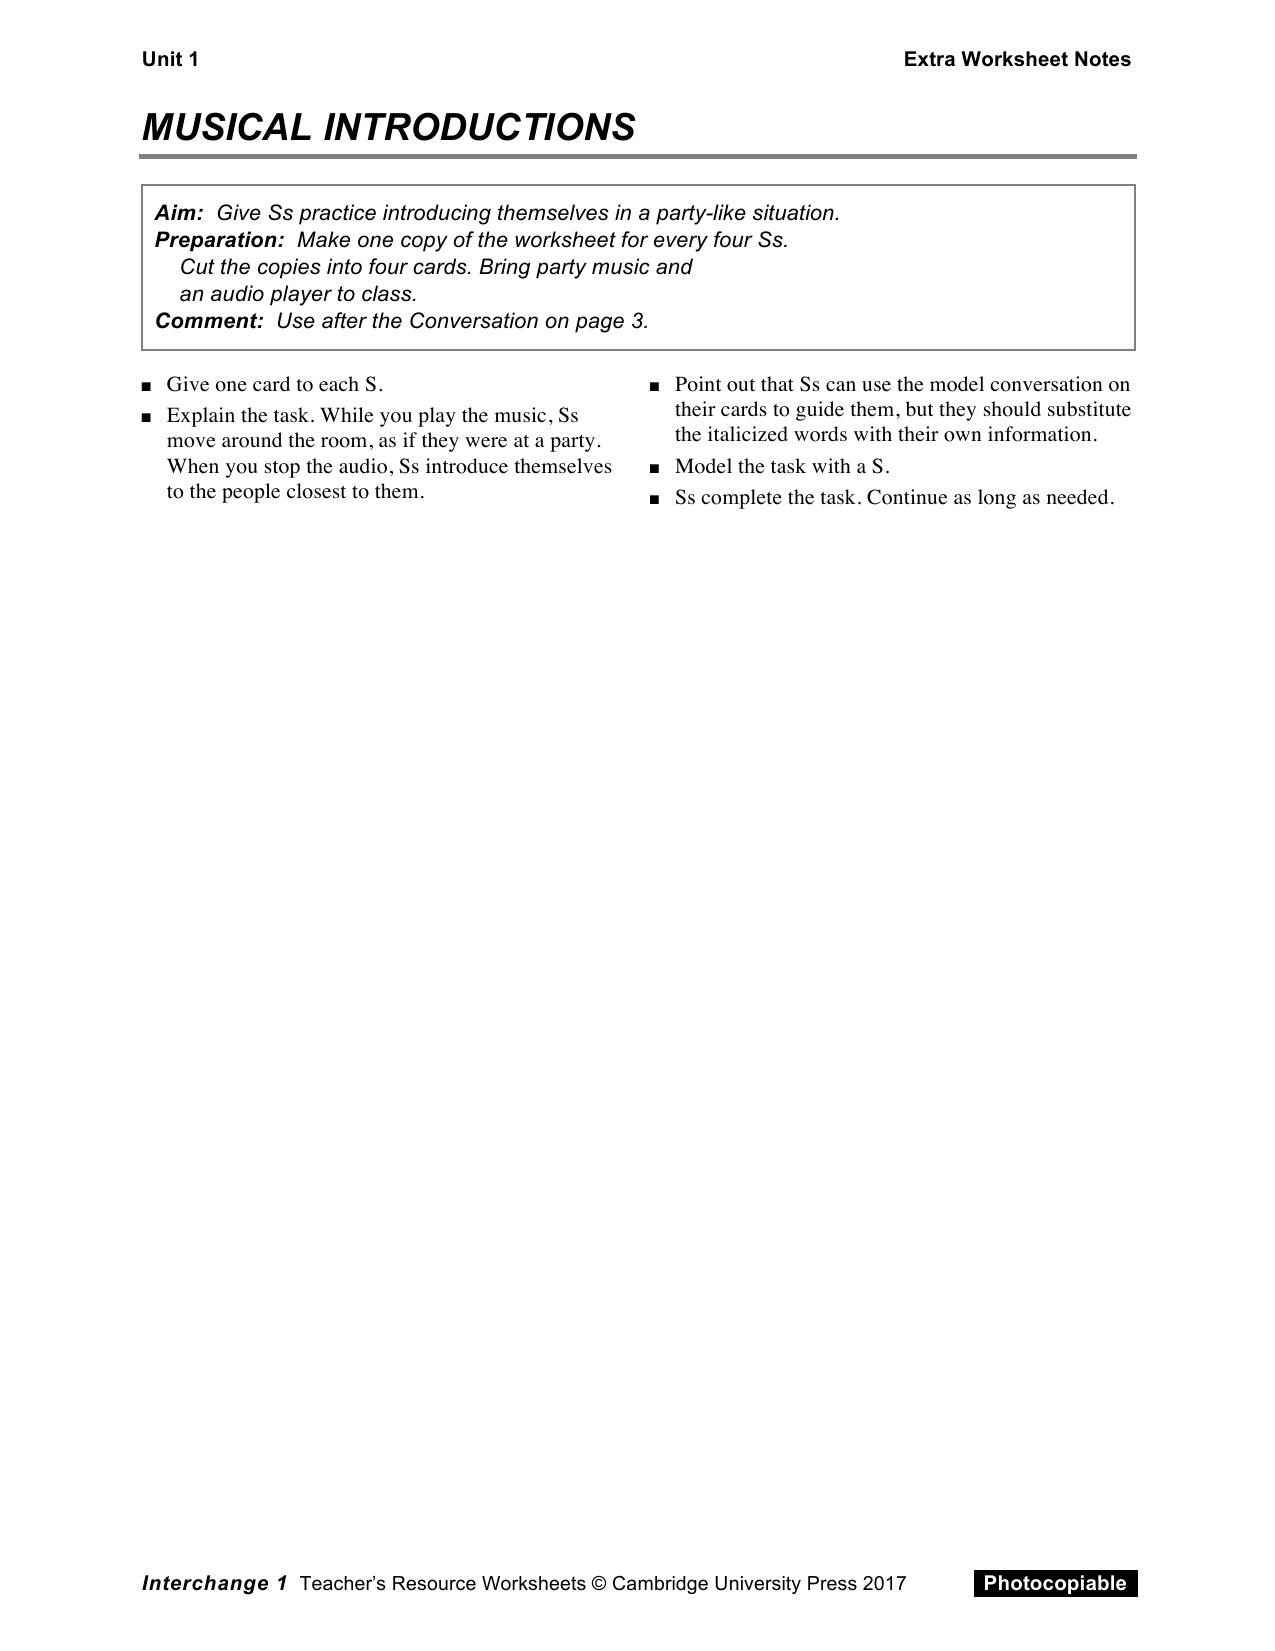 Interchange5thed Level1 Unit01 Extra Worksheet